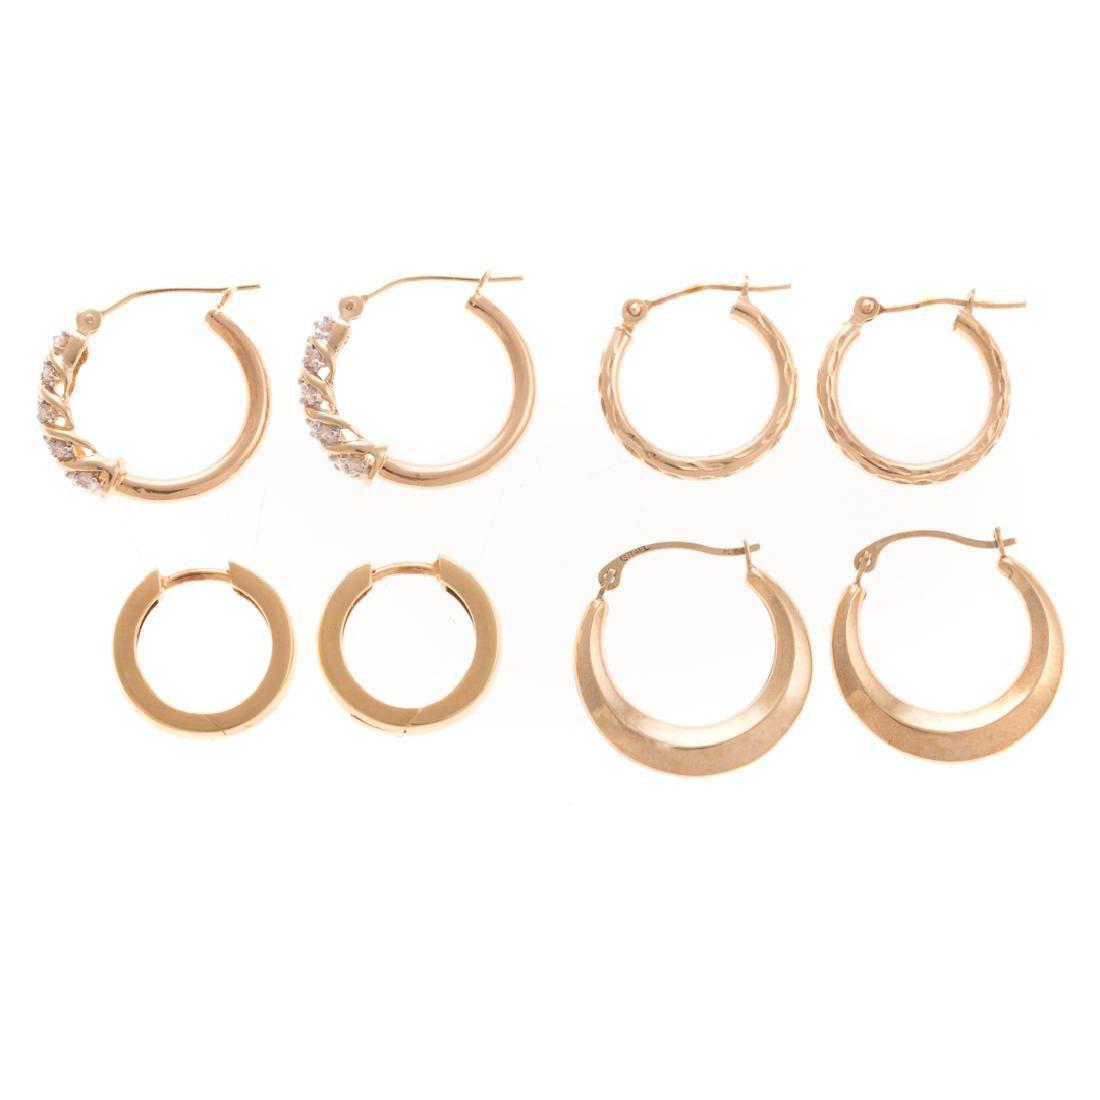 Four Pairs of Lady's Hoop Earrings in Gold